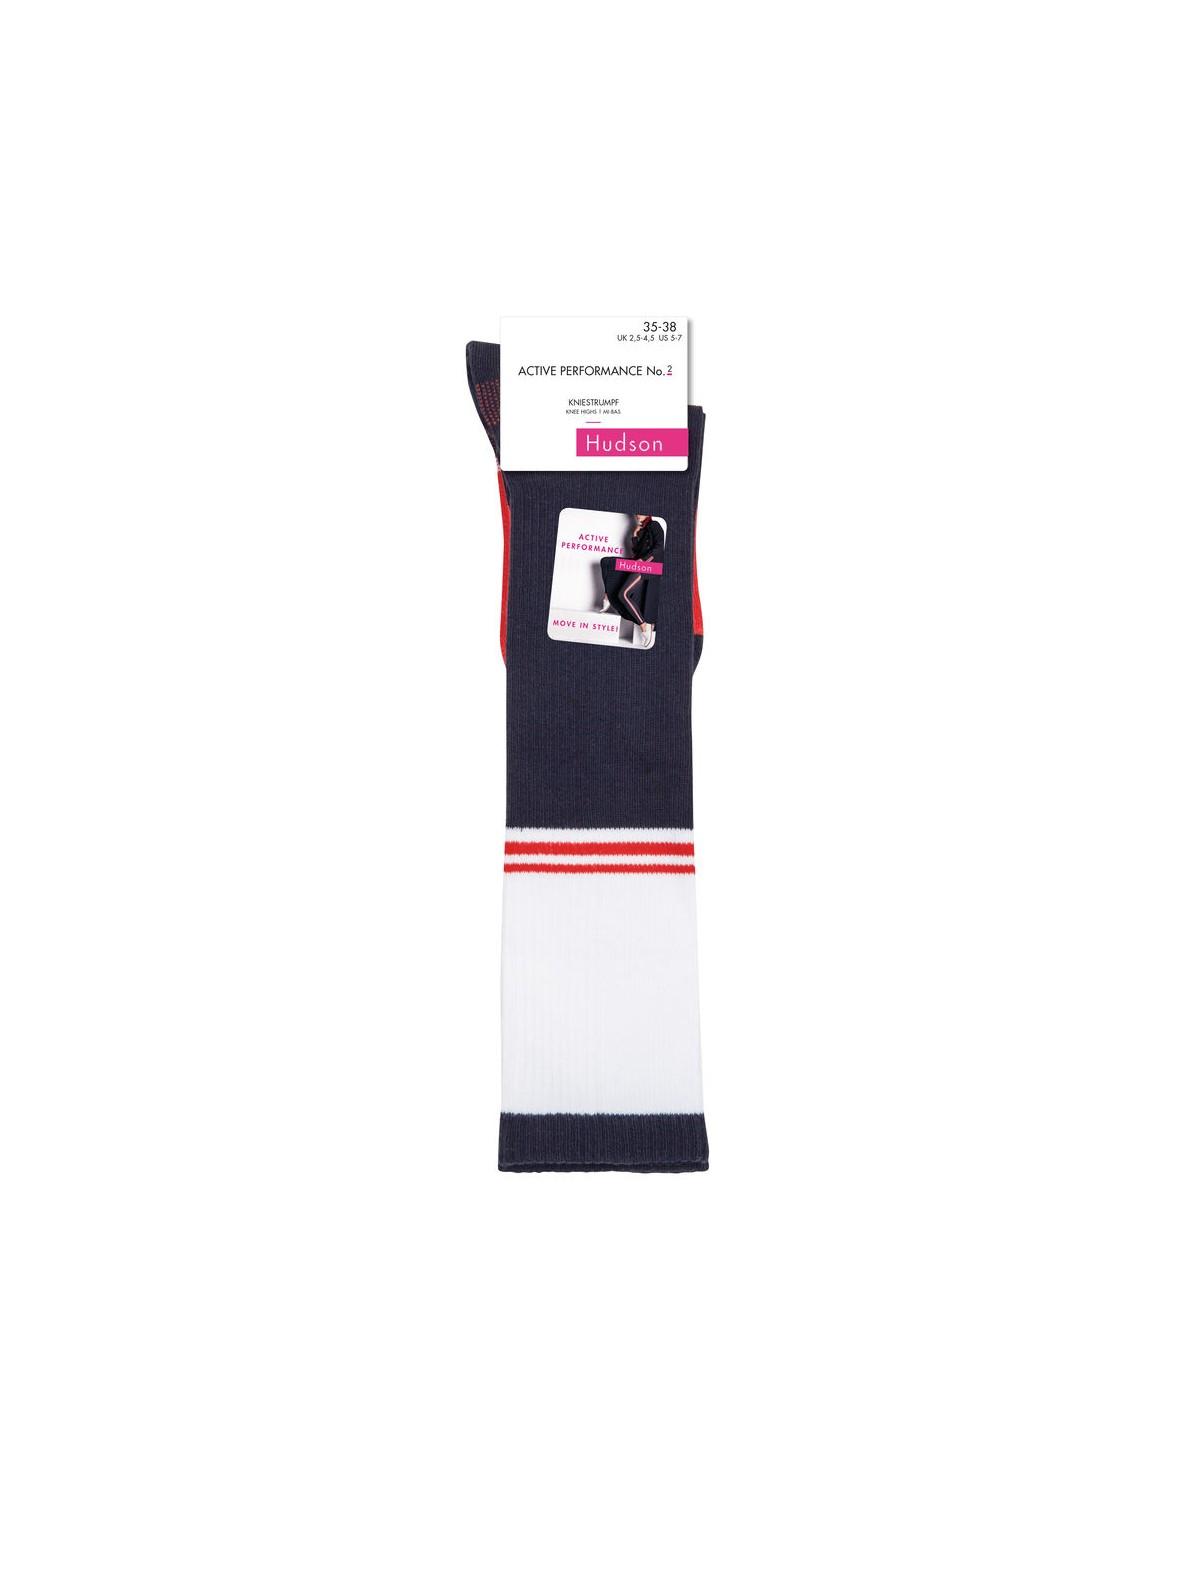 7c29c9aa4 Hudson Active Performance No. 2 Knee High Socks ...